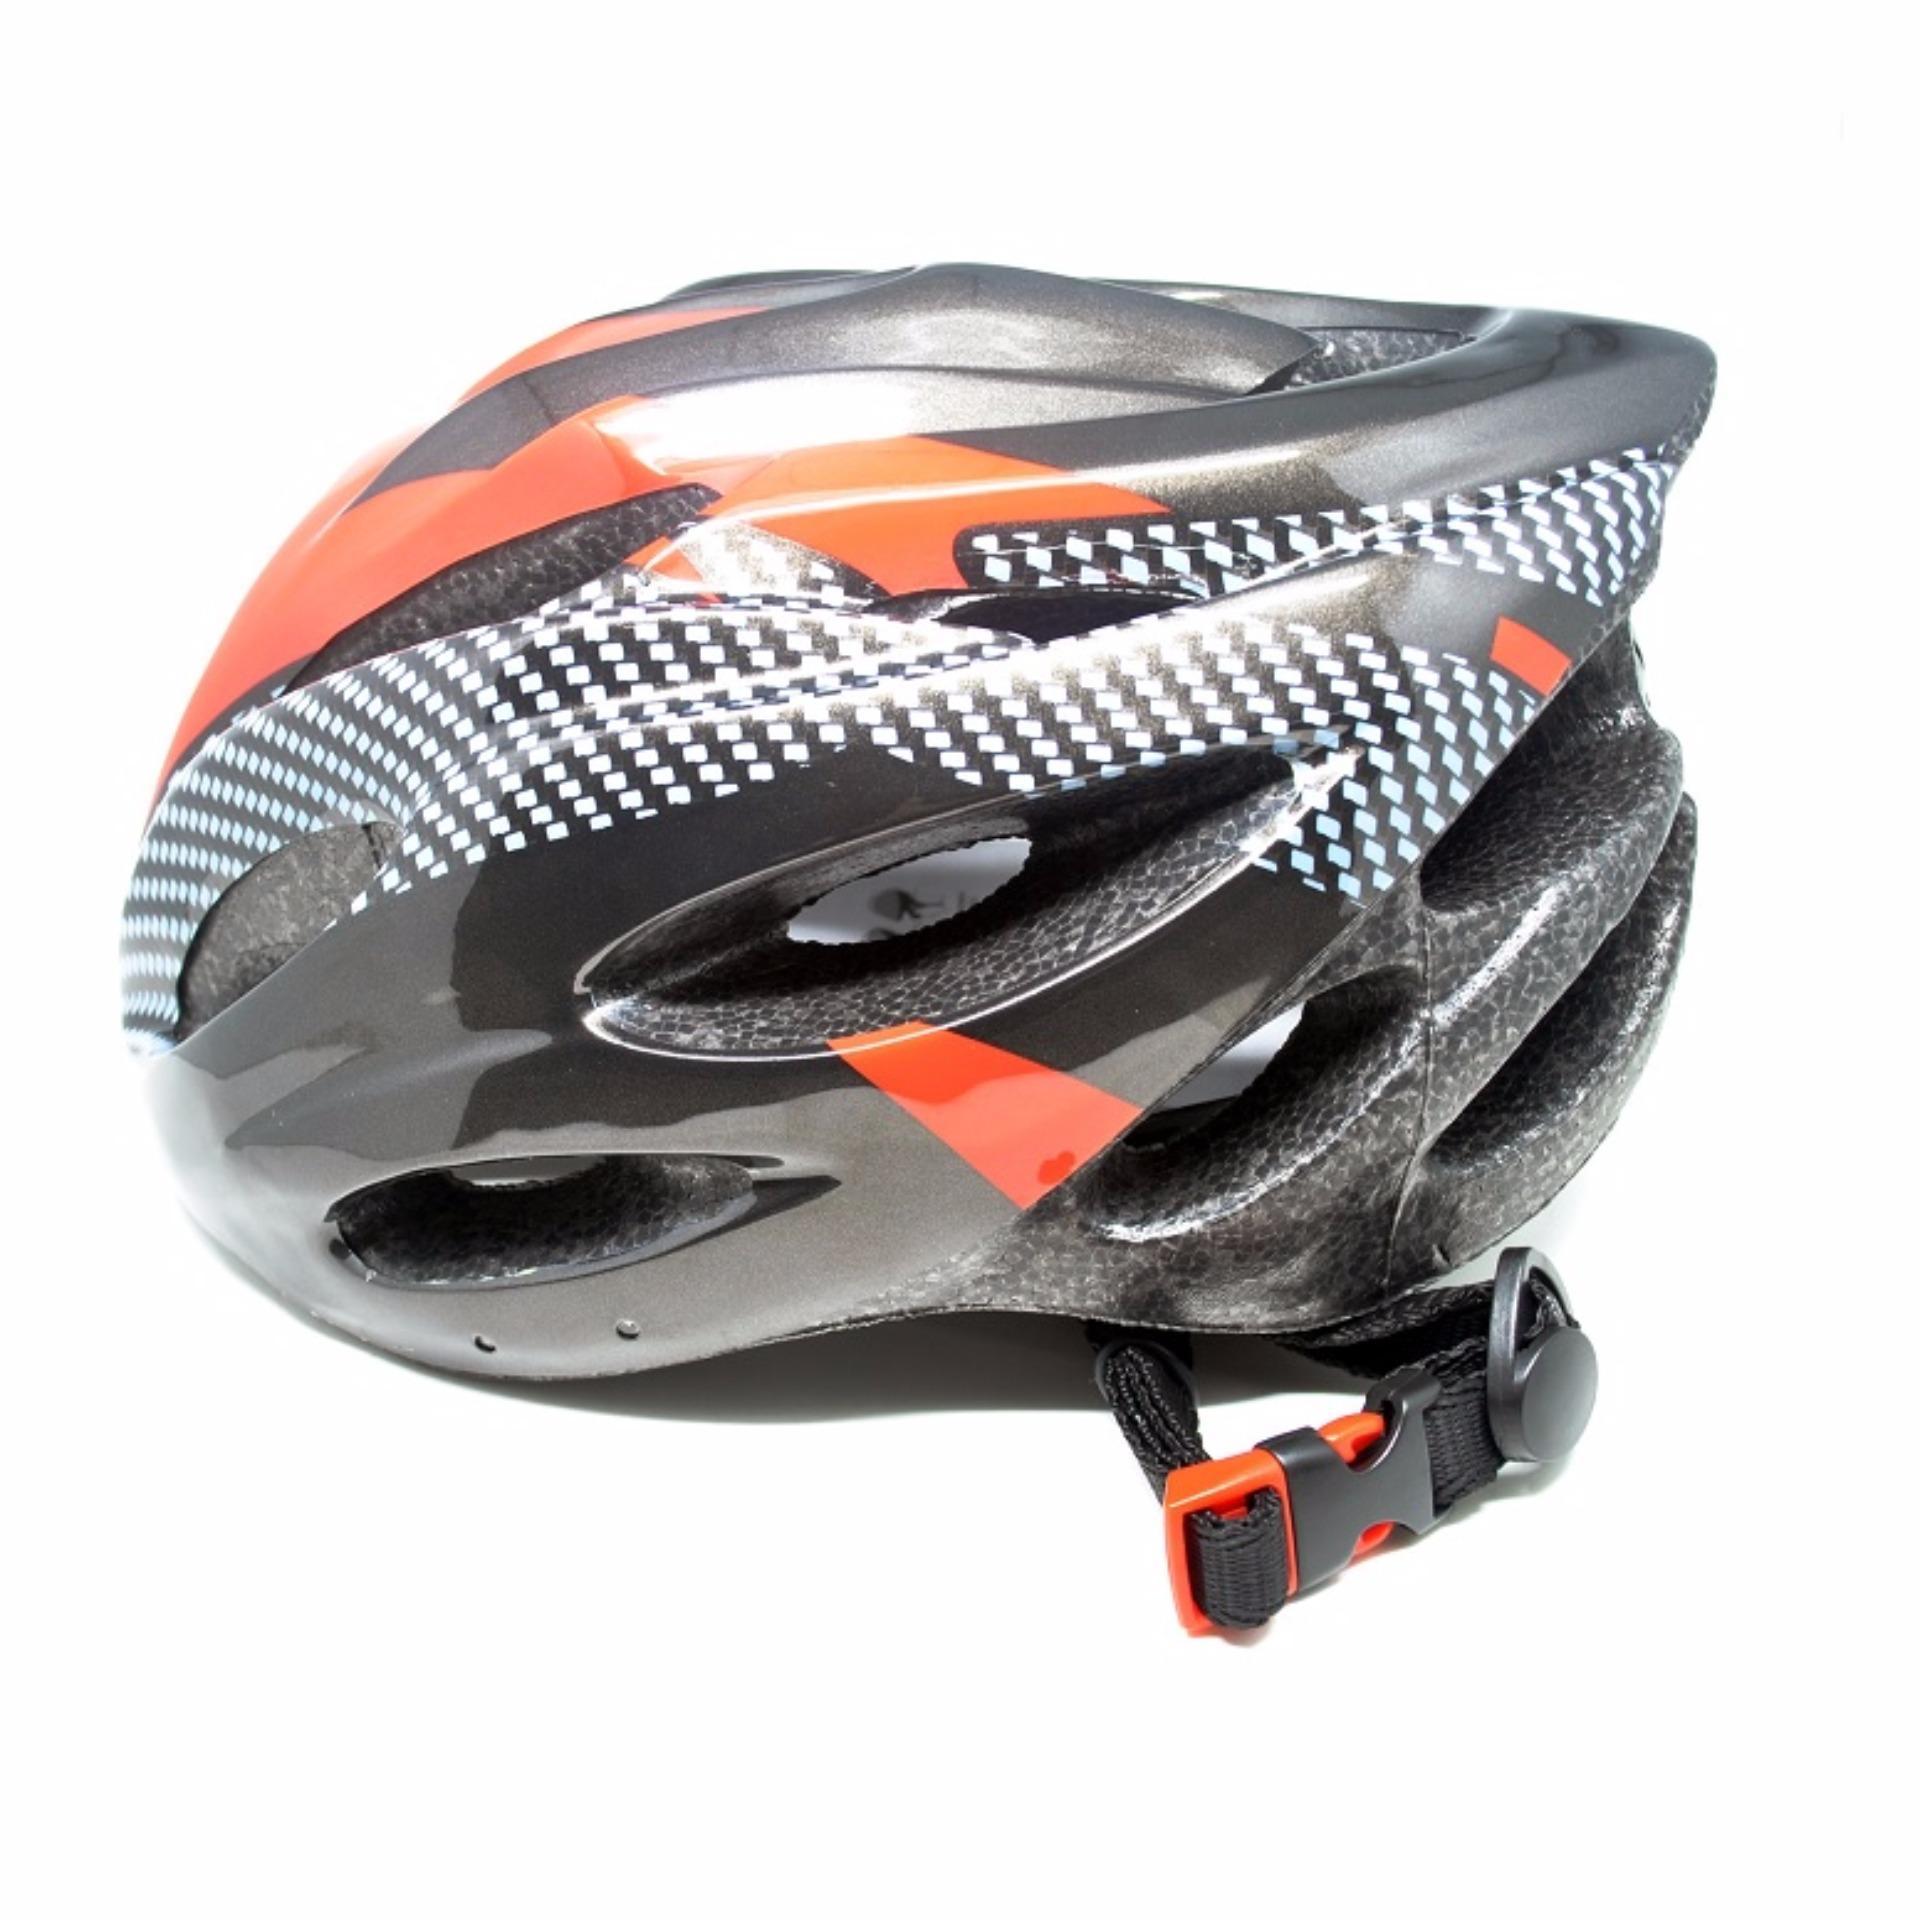 four- u helm sepeda eps foam pvc shell – x10